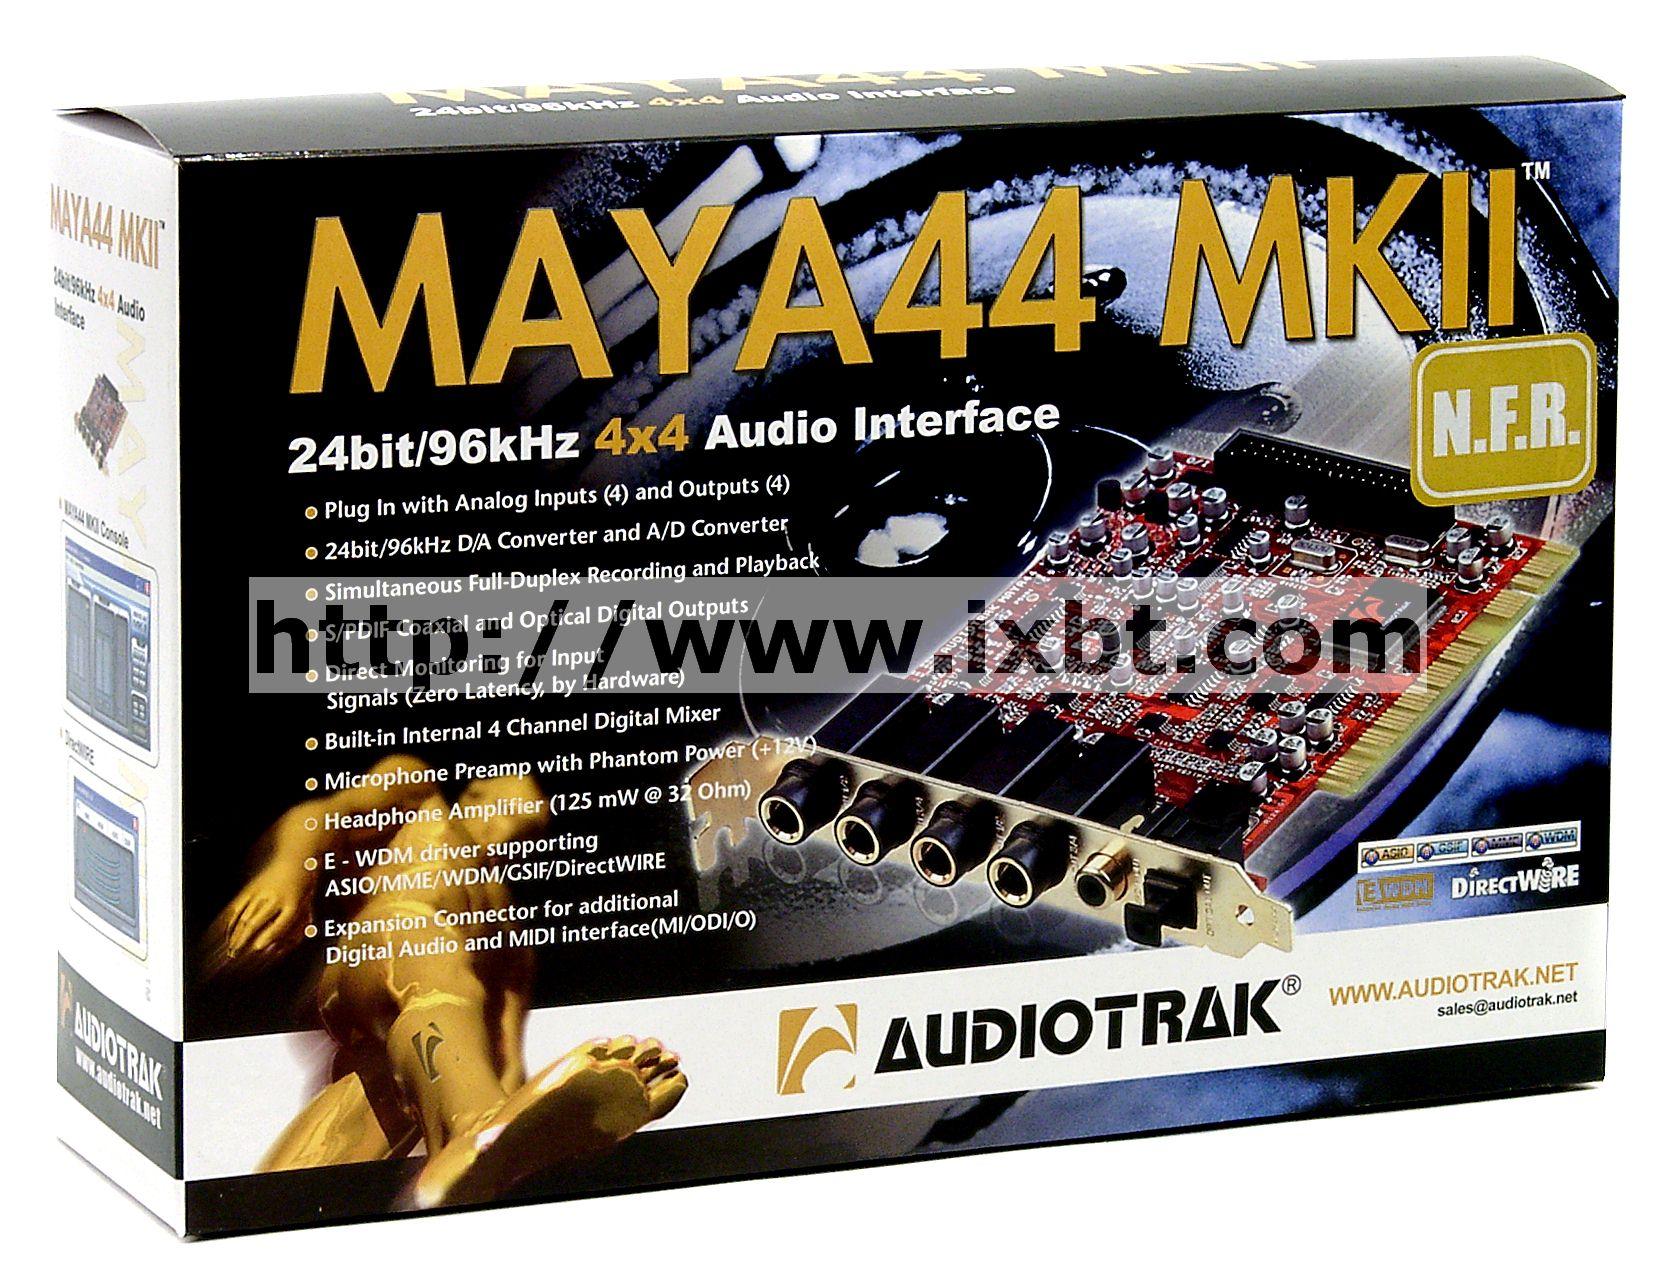 AUDIOTRAK MAYA 44 MKII WINDOWS 7 X64 DRIVER DOWNLOAD